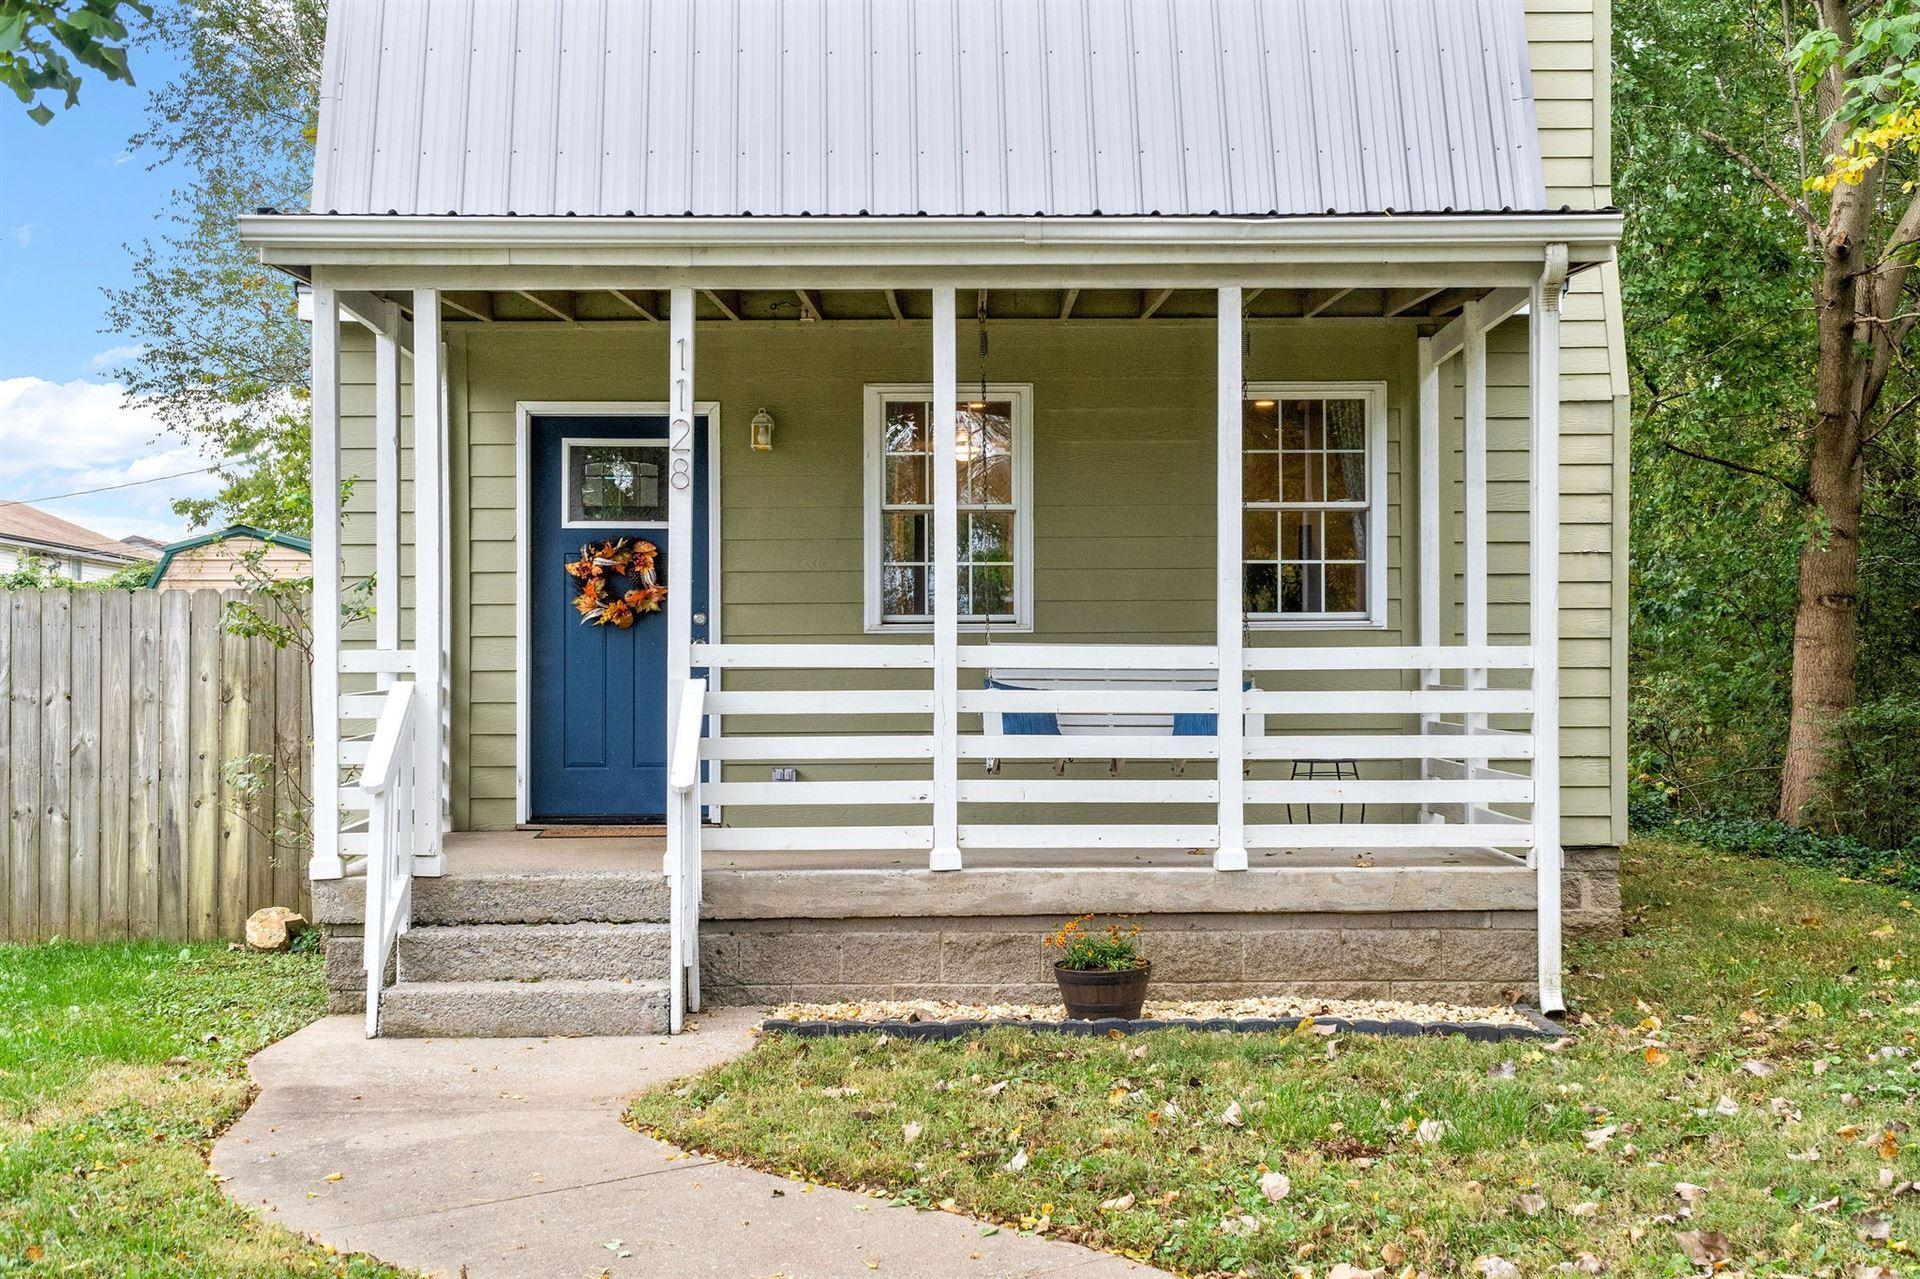 1128 Patton Pl, Oak Grove, KY 42262 - MLS#: 2199331